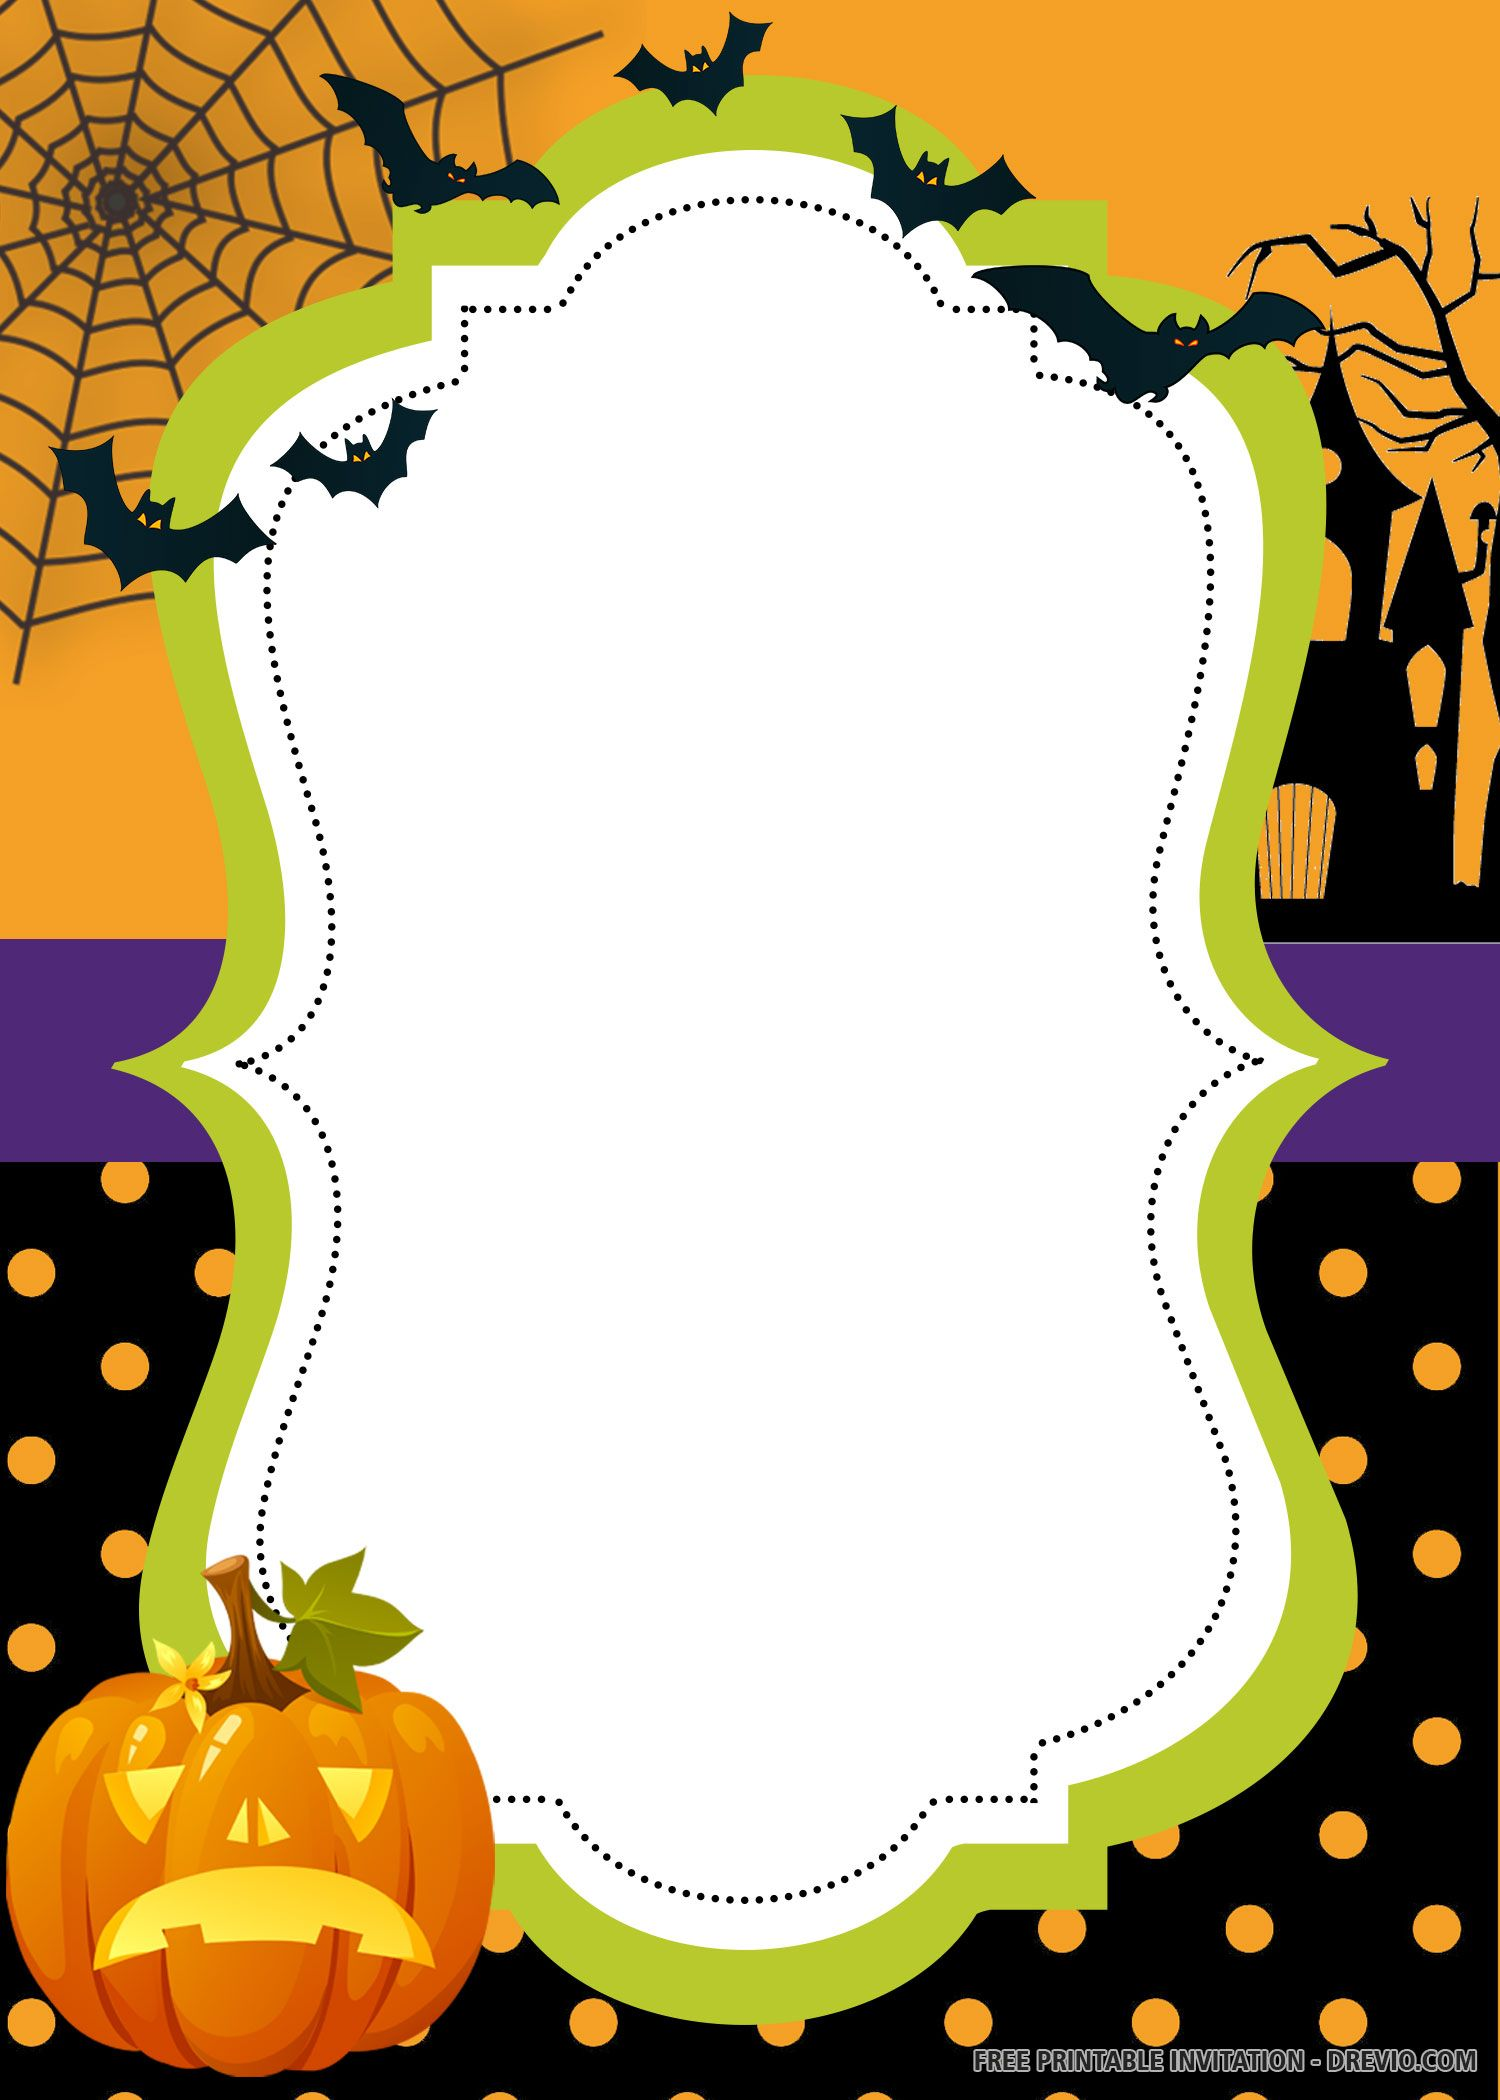 Free Printable Halloween Invitation Templates Halloween Invitation Templates Printable Halloween Invitations Free Printable Halloween Invitations